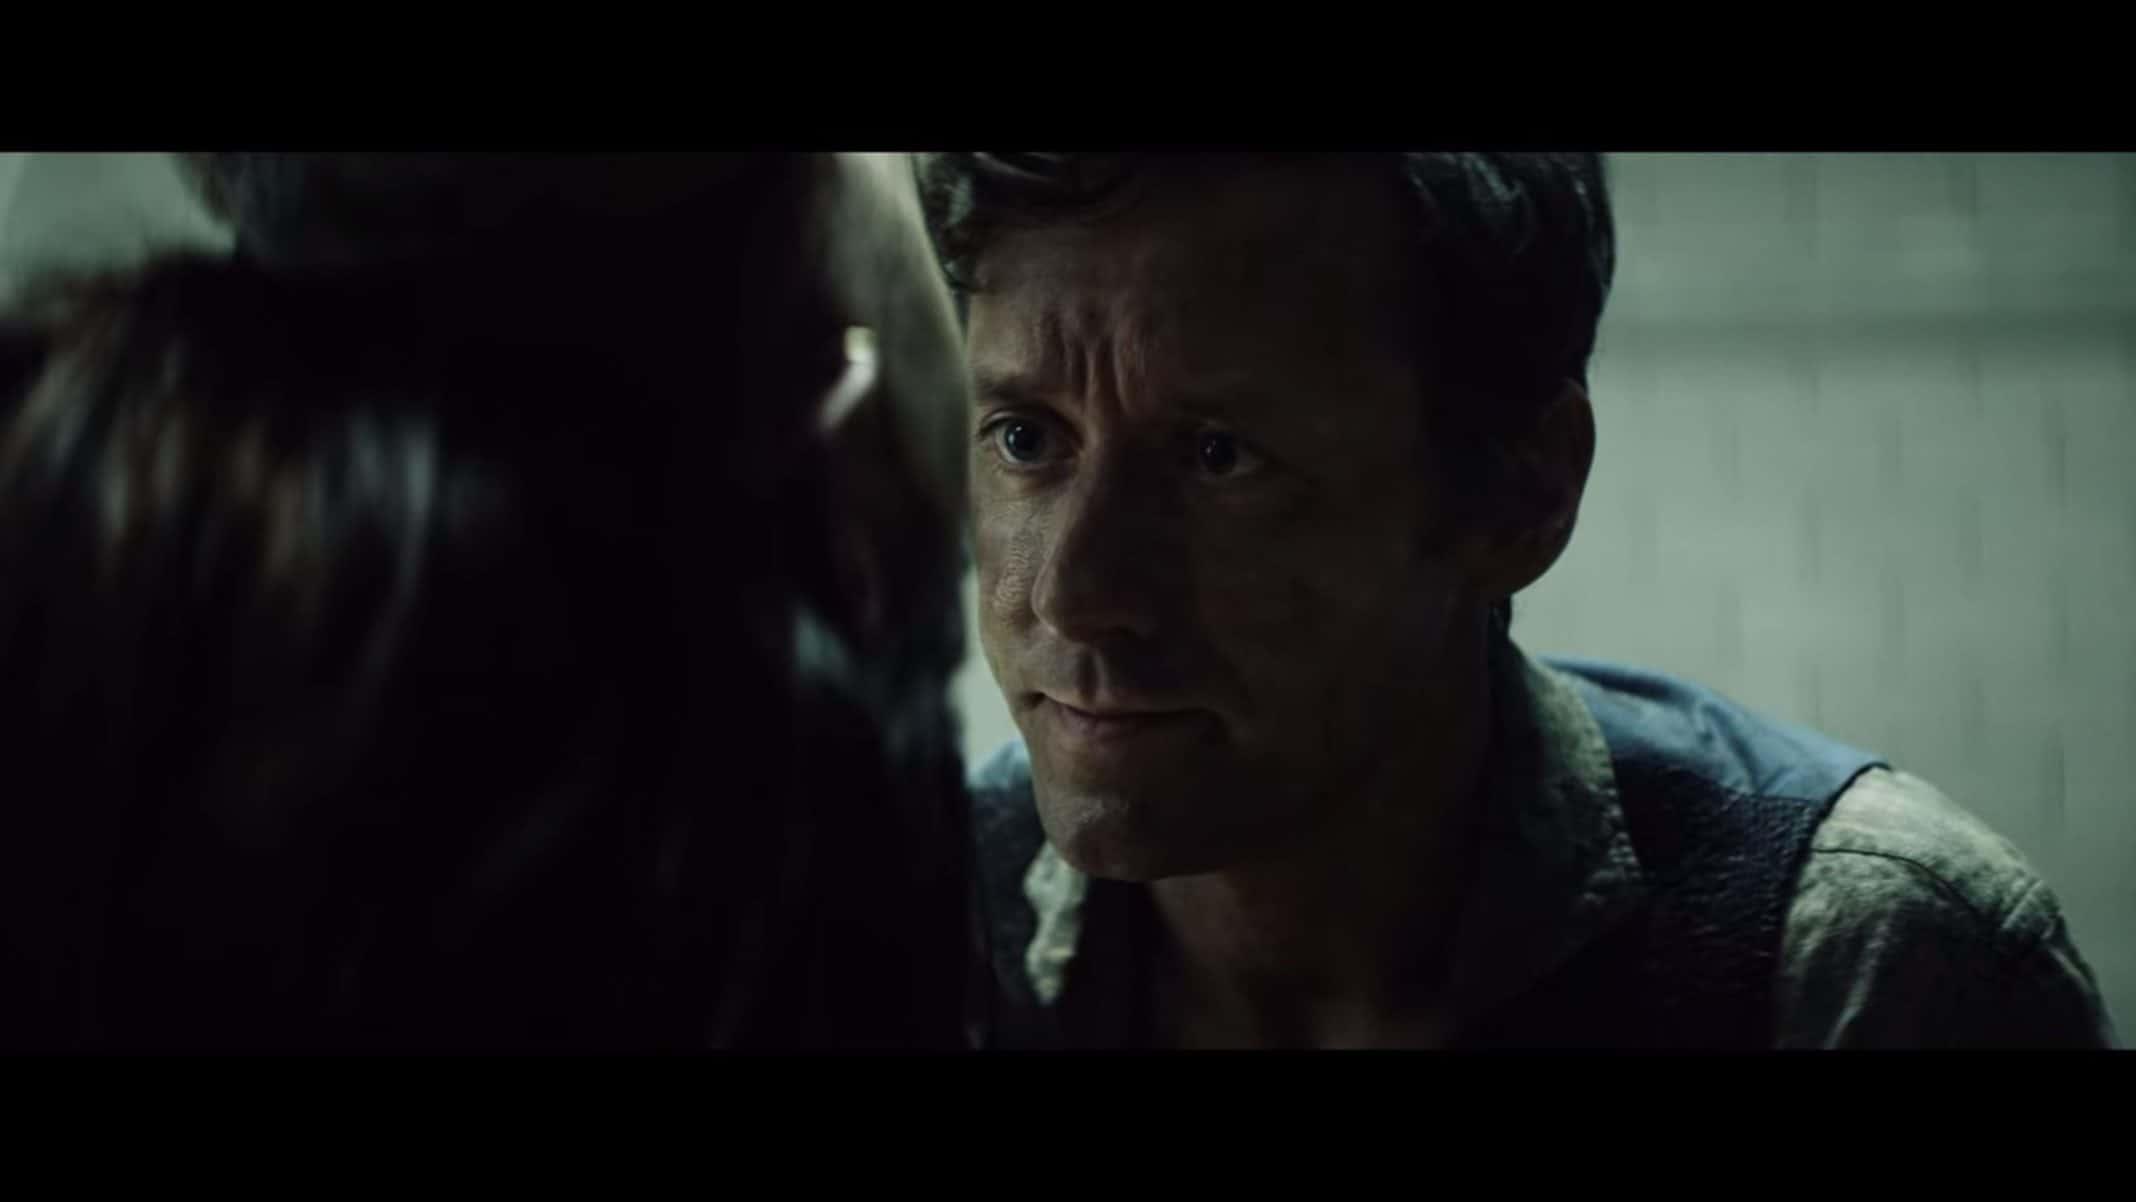 Jacob (Thomas Gullestad) talking to Leo, as she hangs upside down.